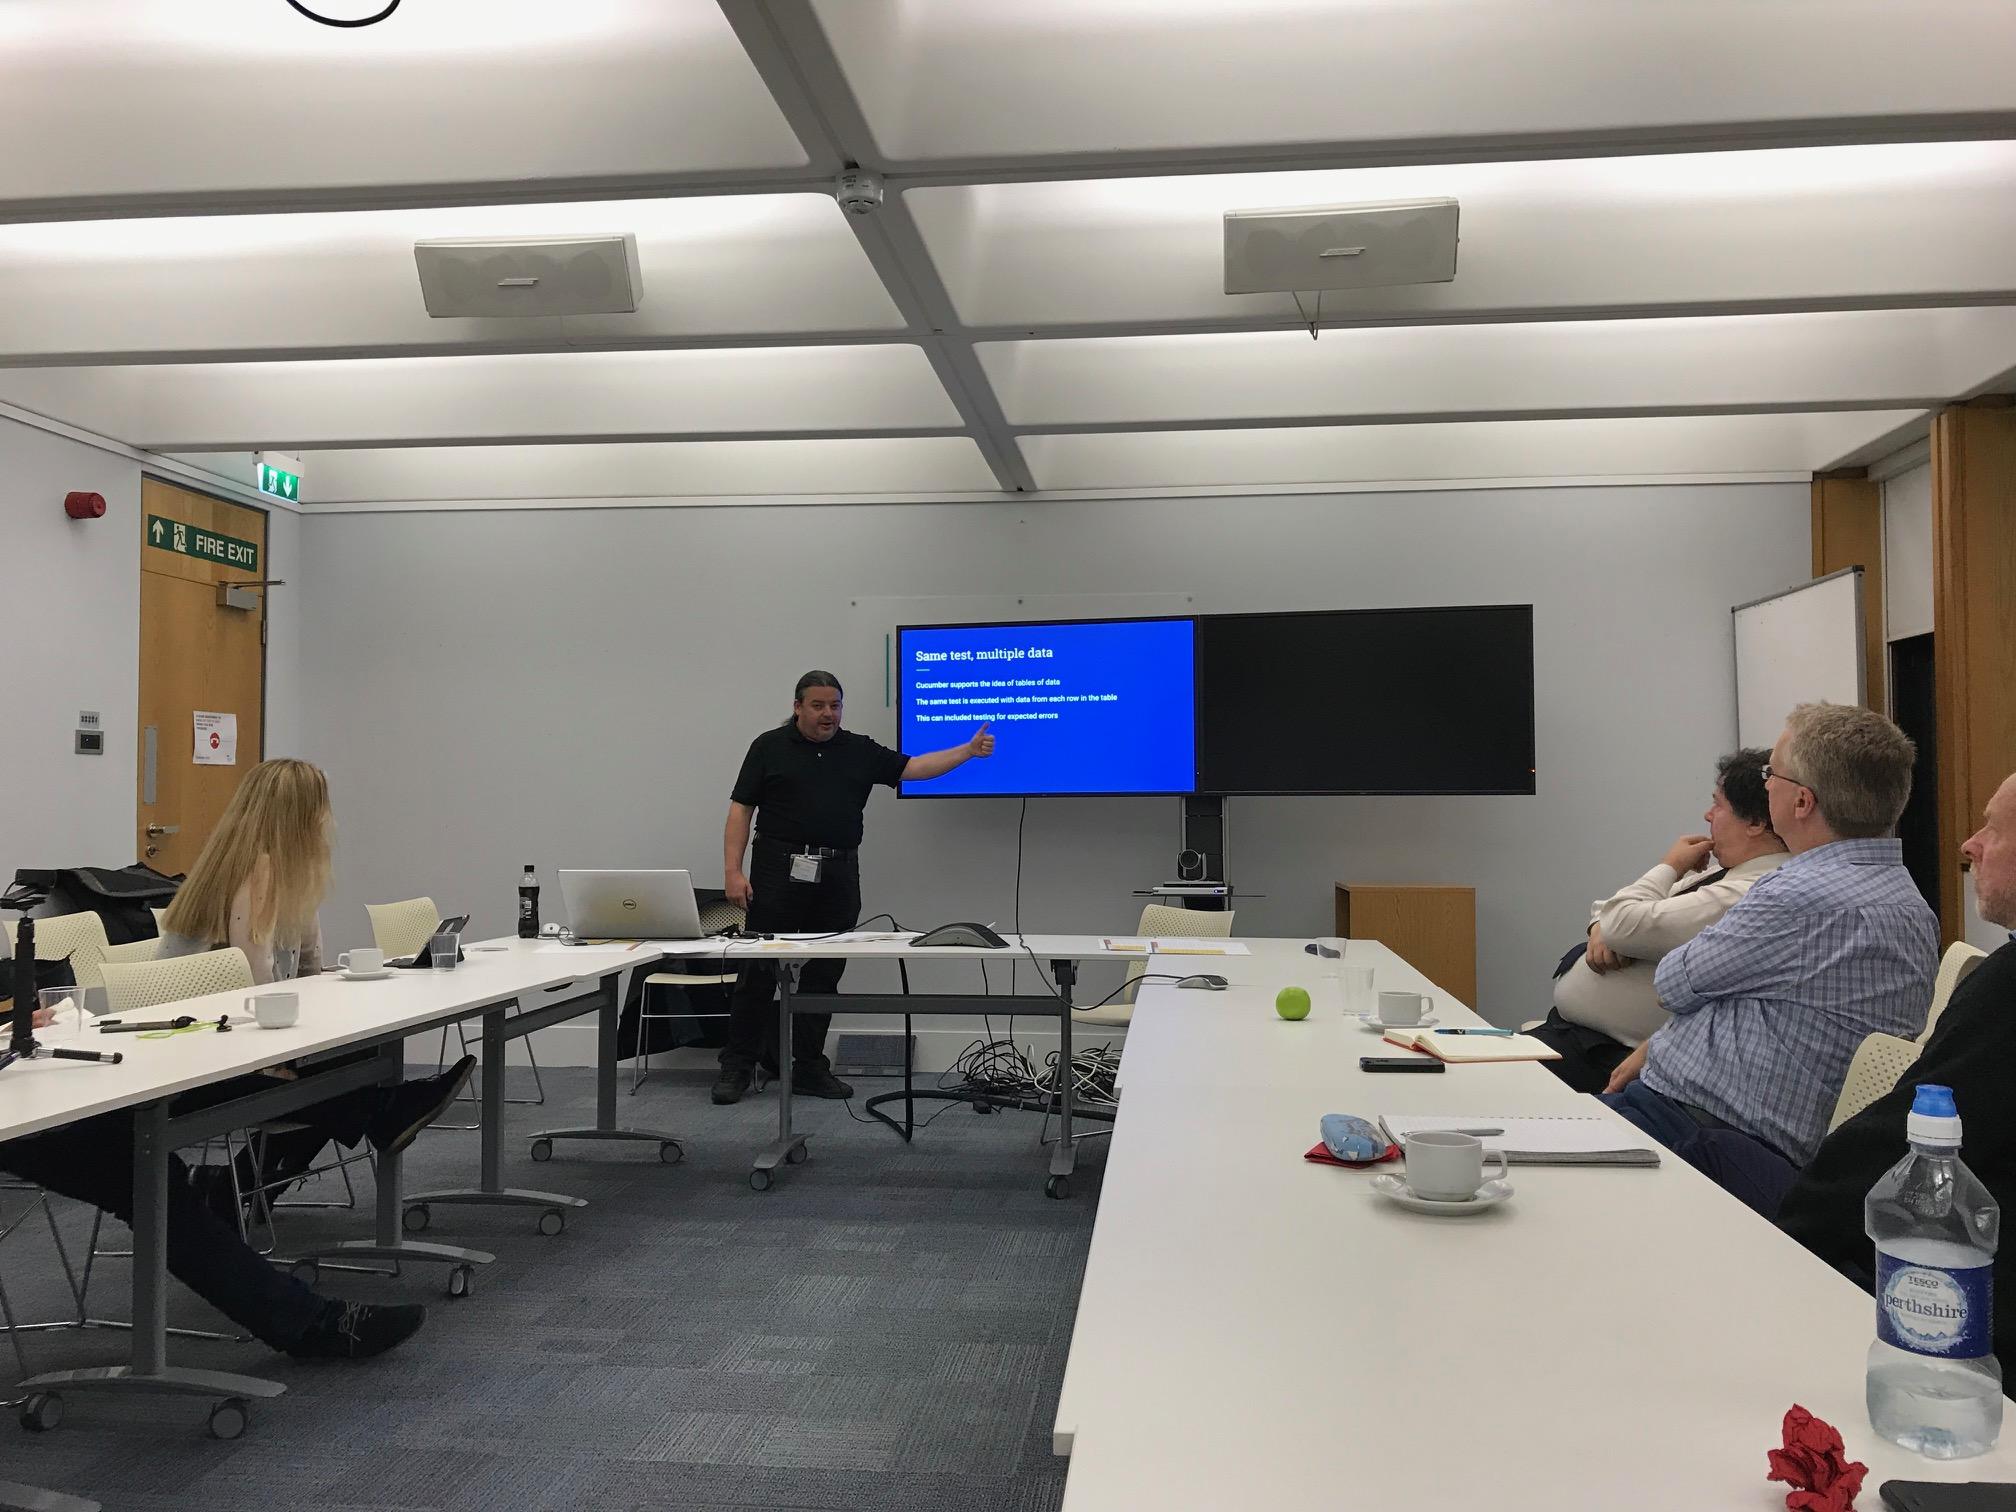 David Durant presenting